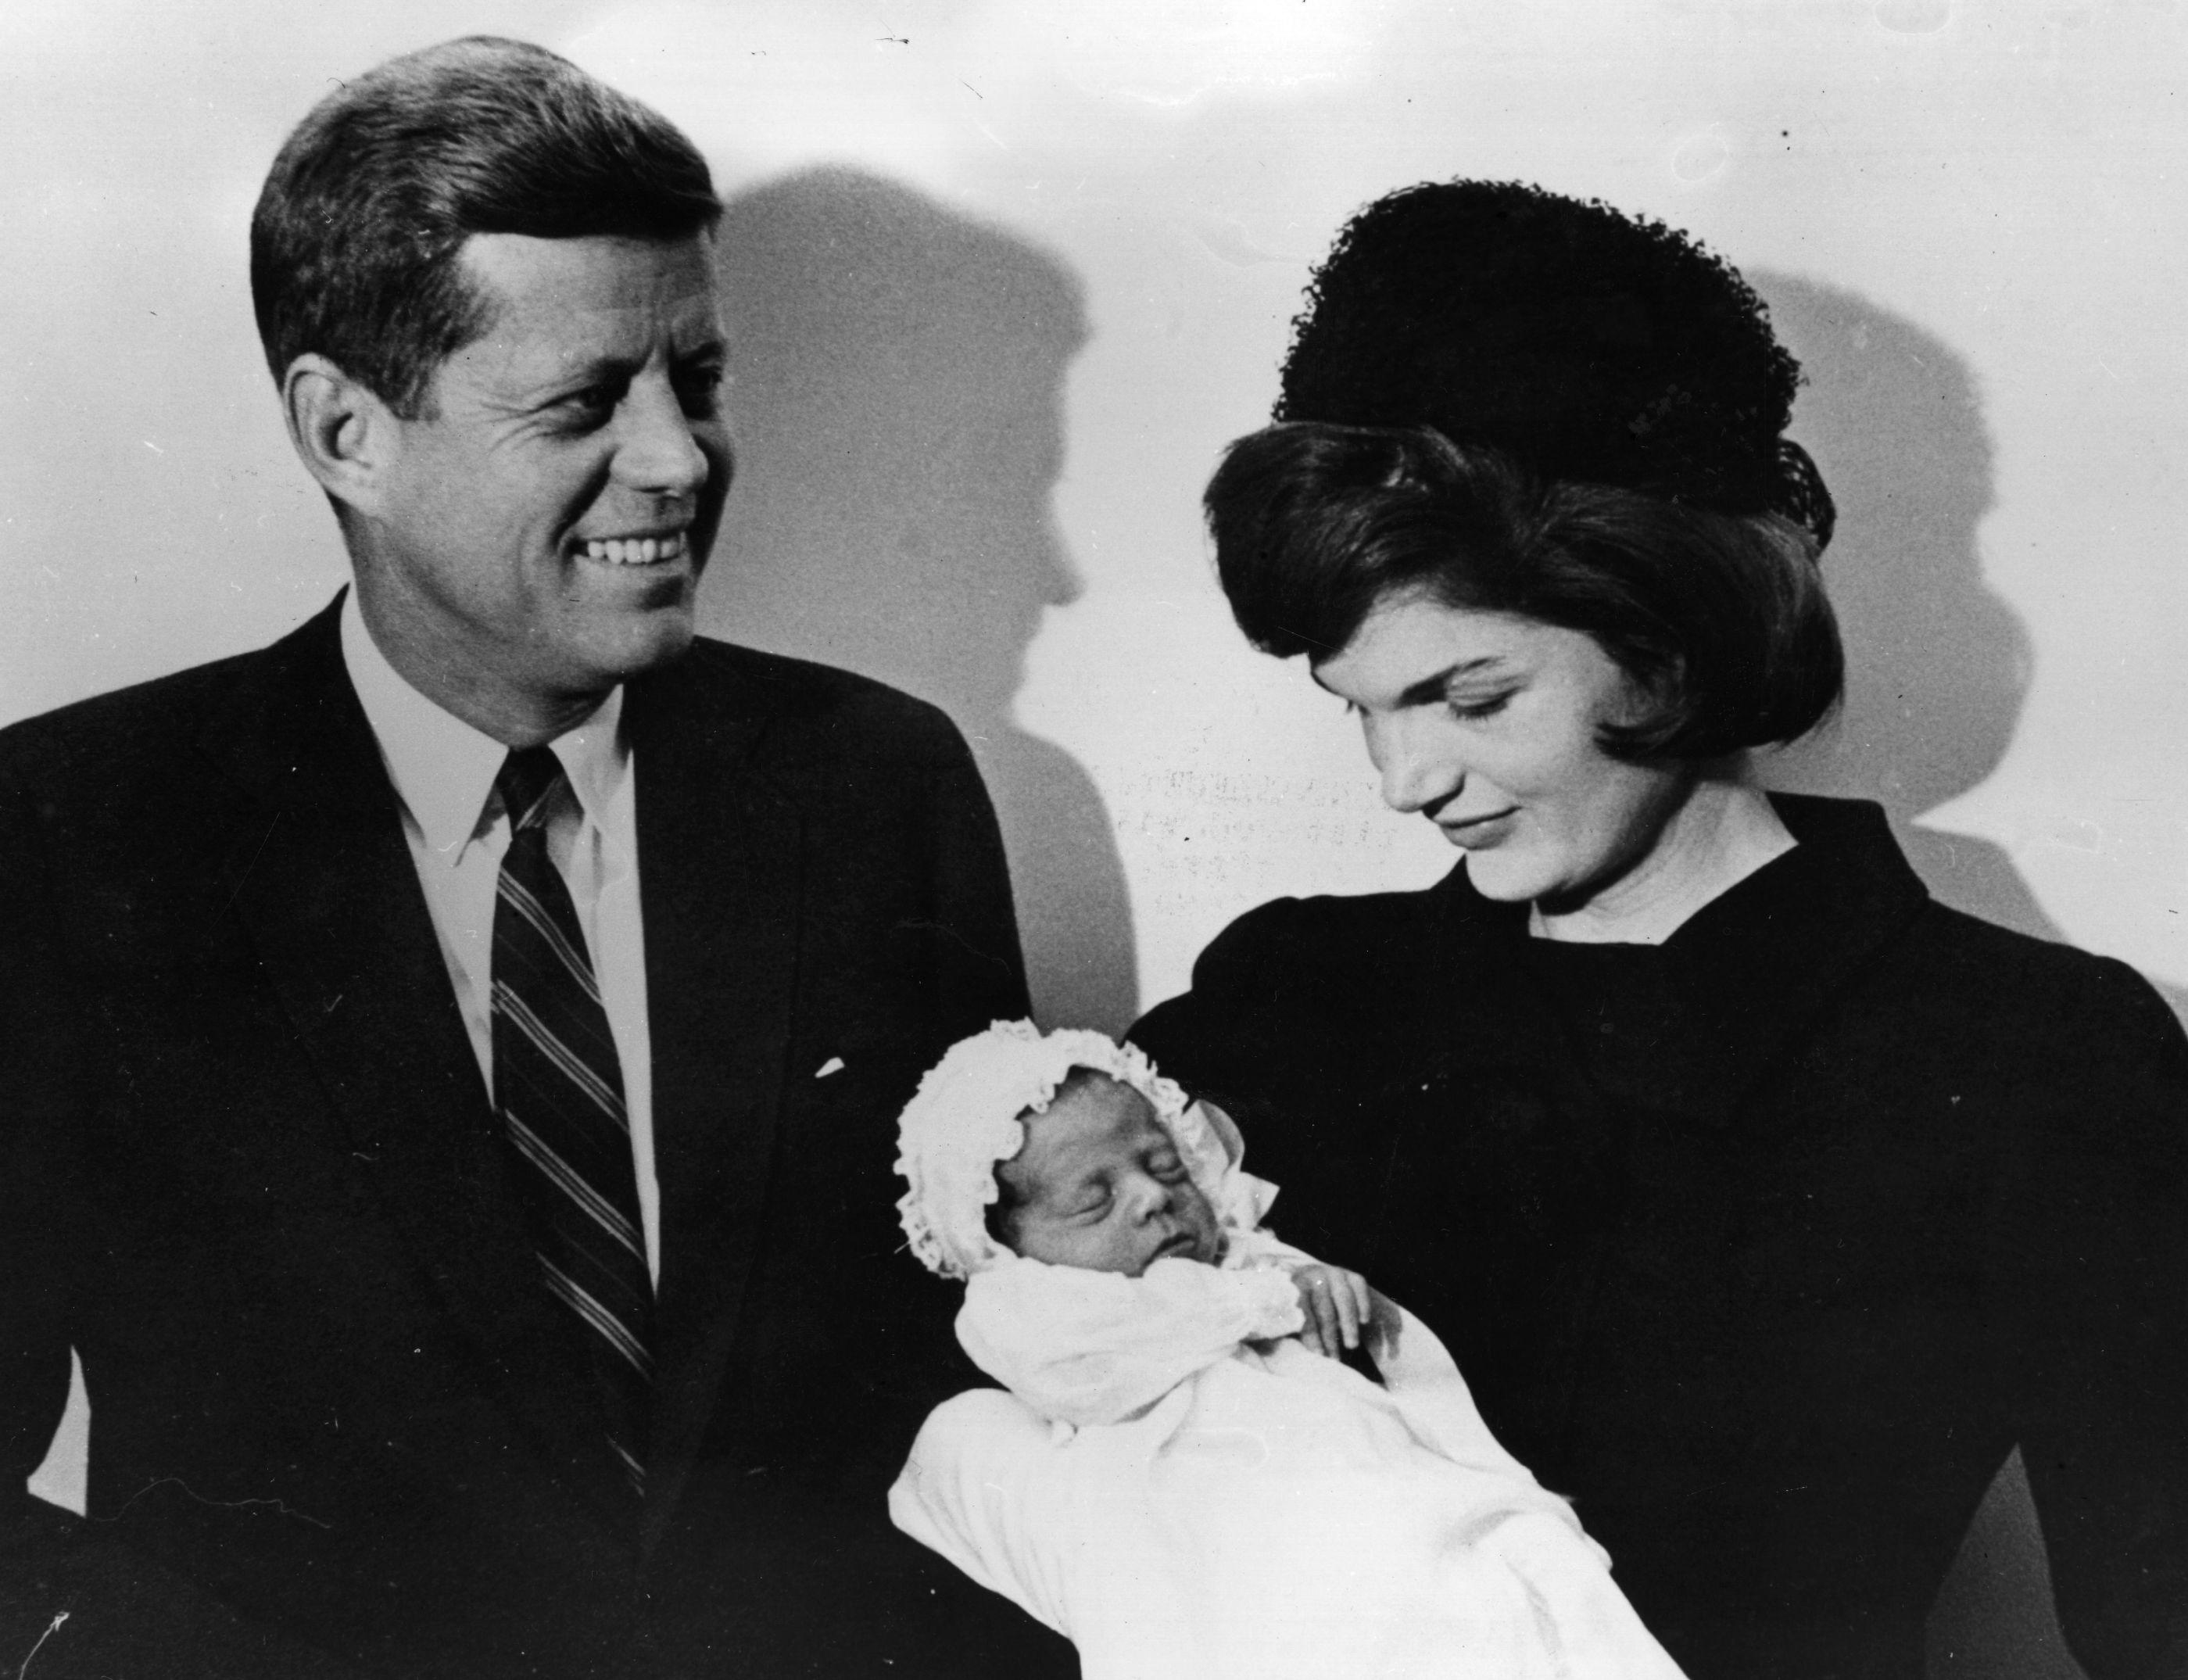 John F Kennedy and Jackie